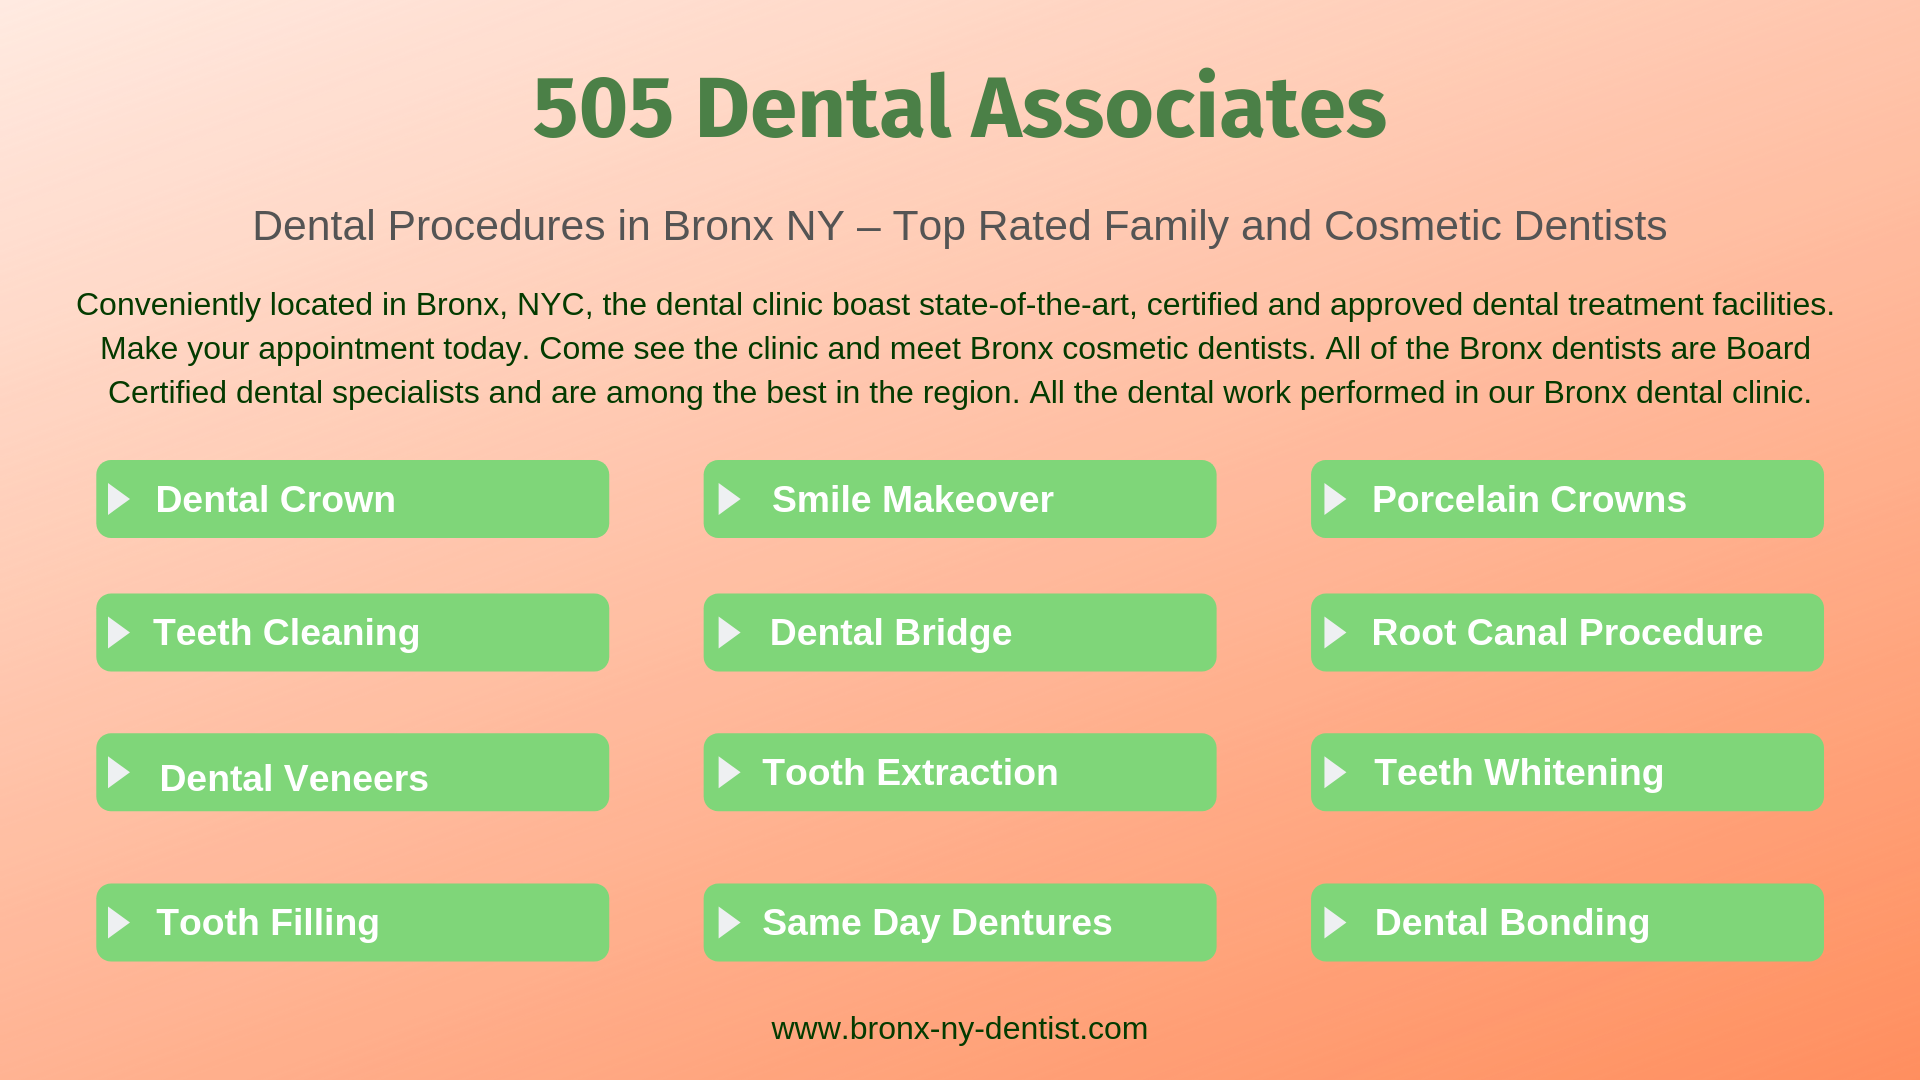 505 dental associates 2